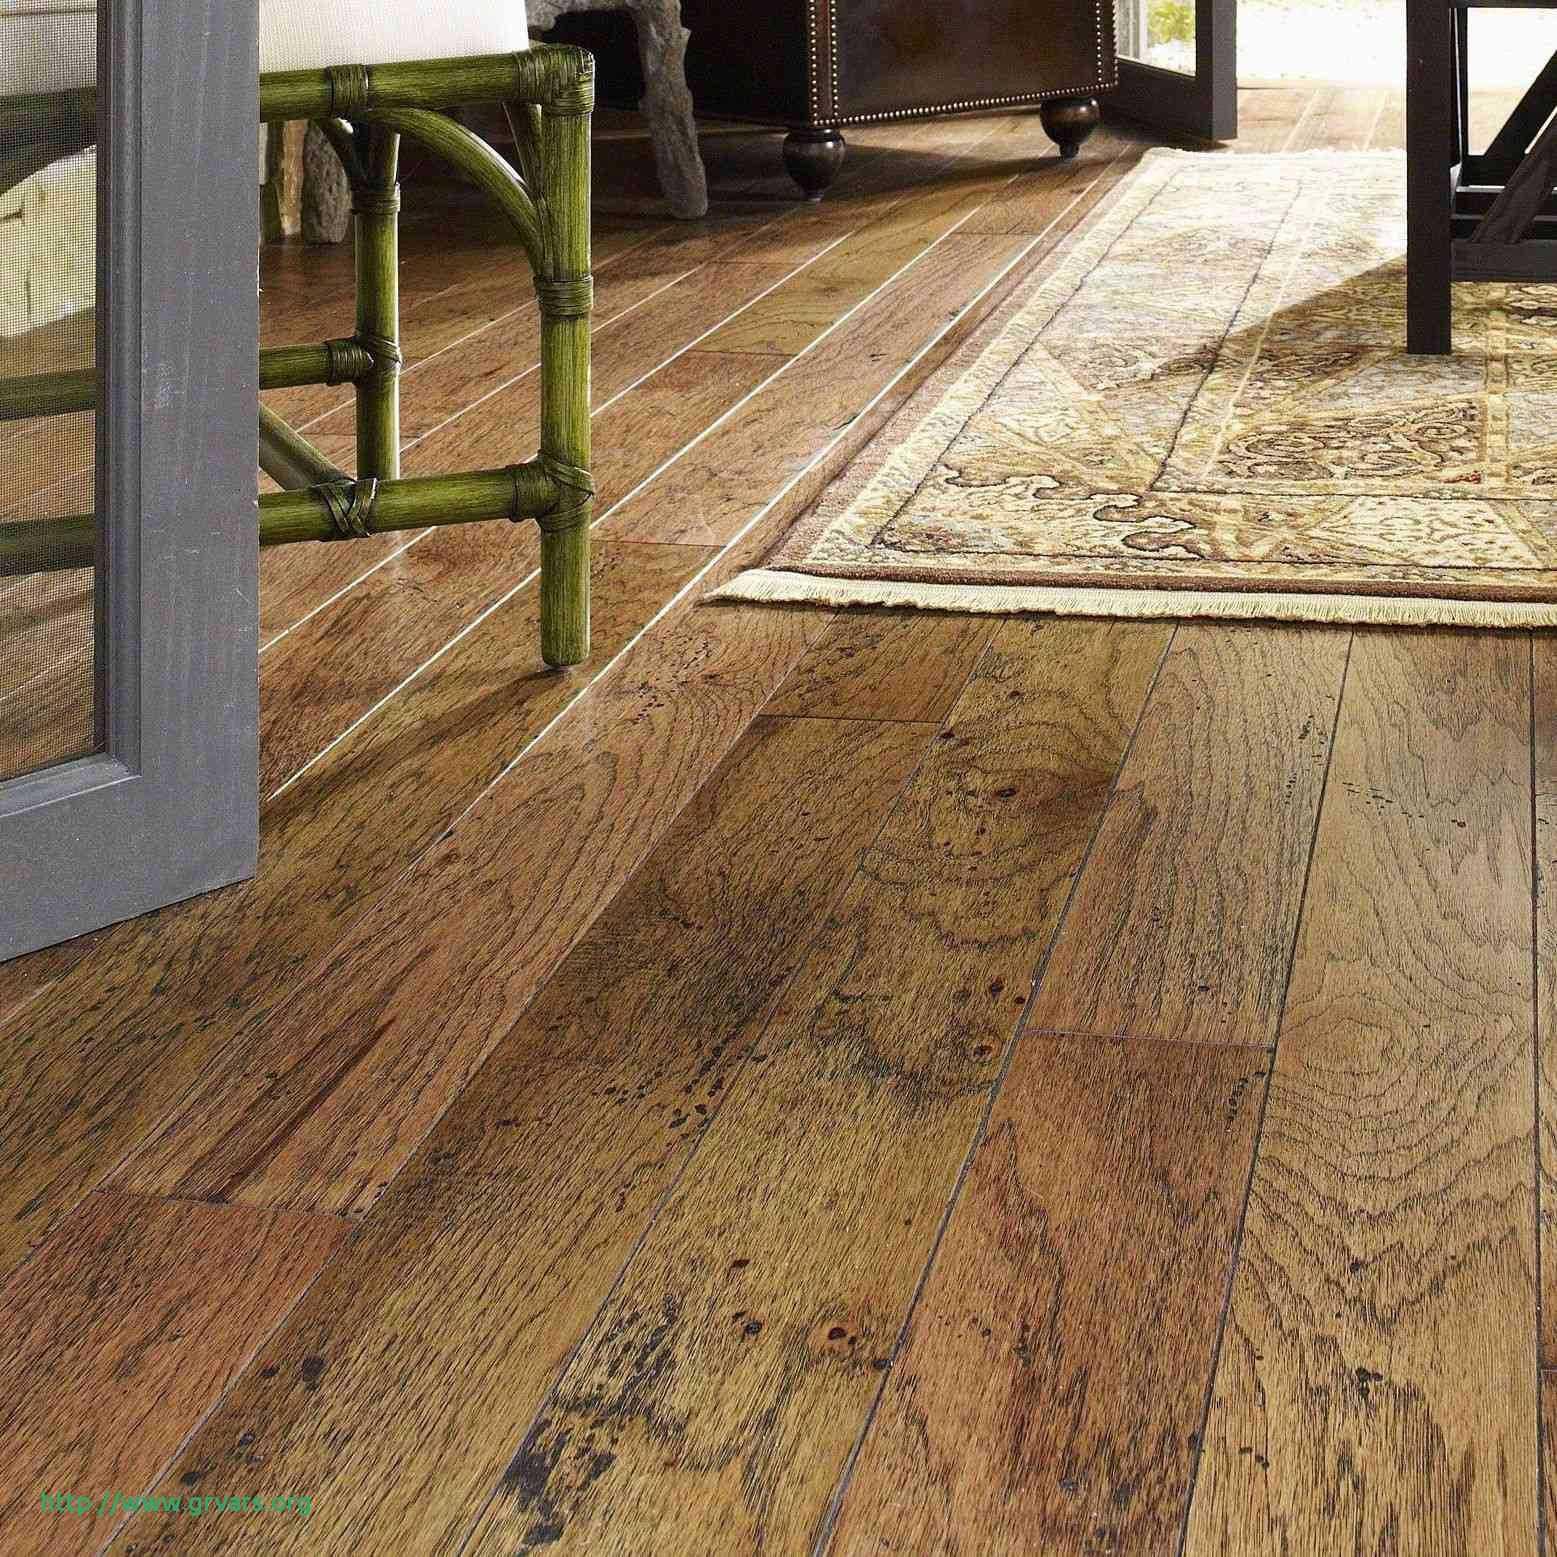 Trafficmaster Original Engineered Wood Flooring